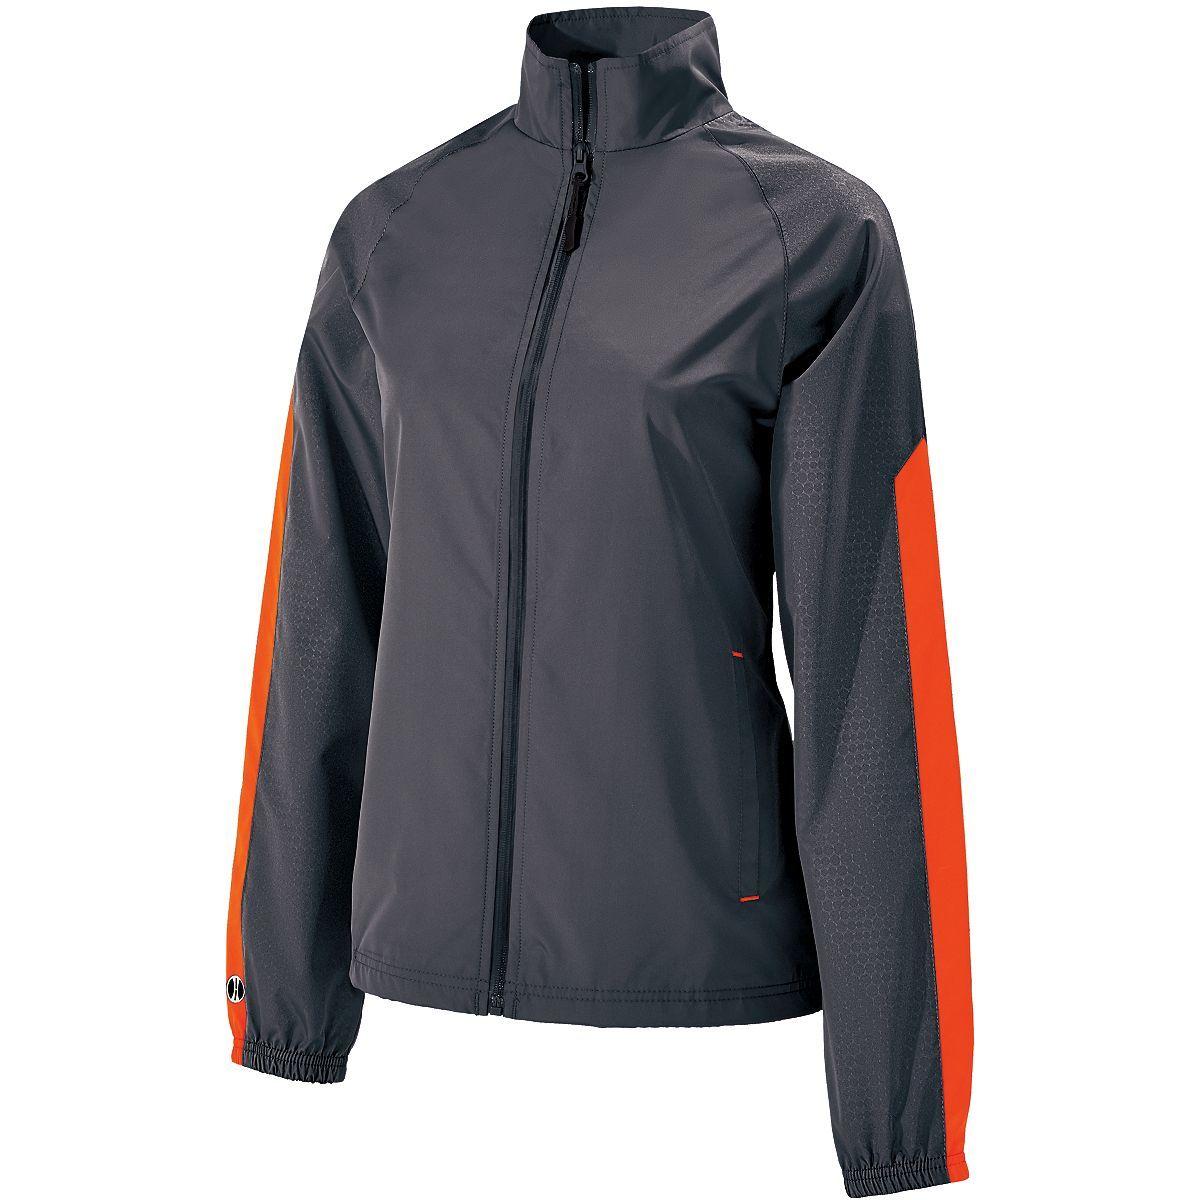 Ladies Bionic Jacket - CARBON/ORANGE